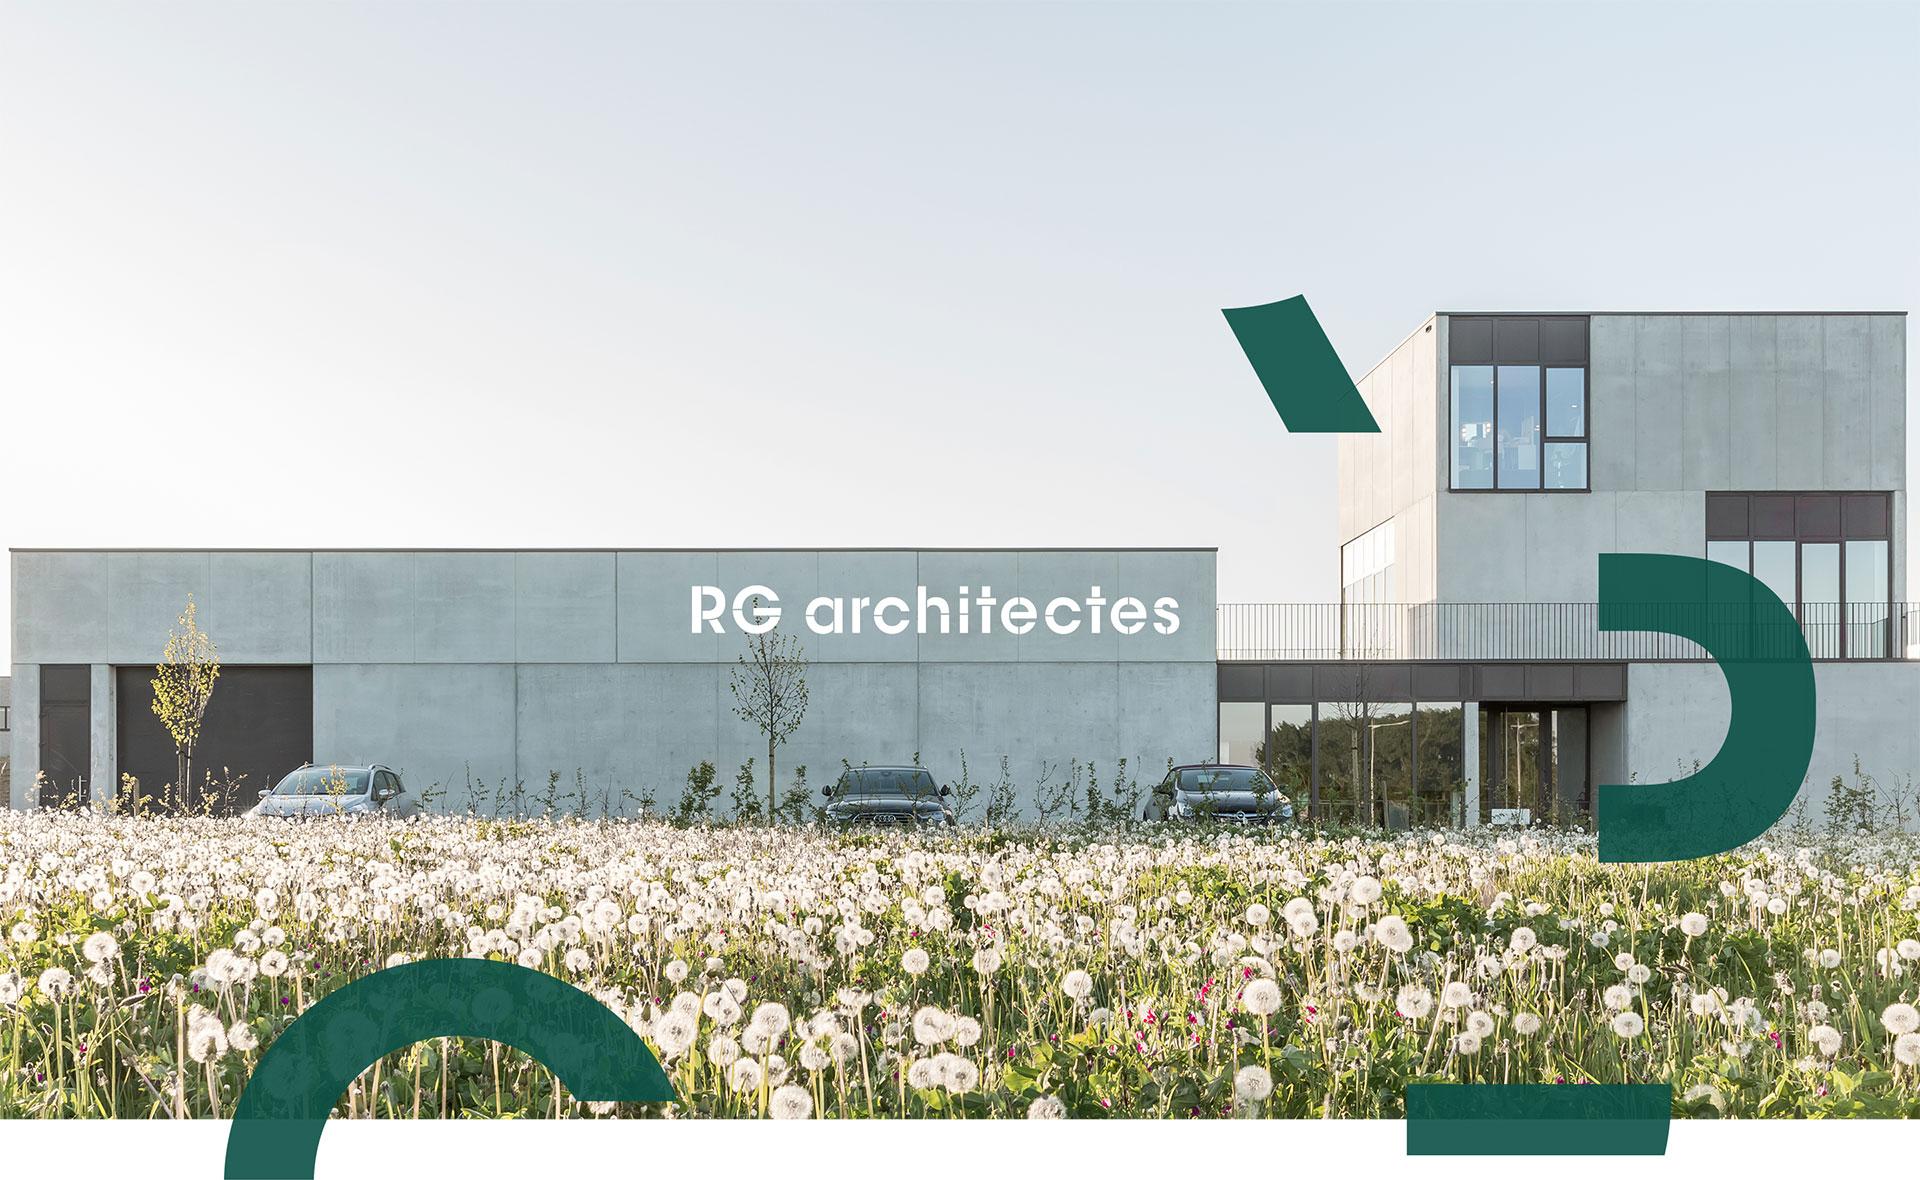 RG architectes